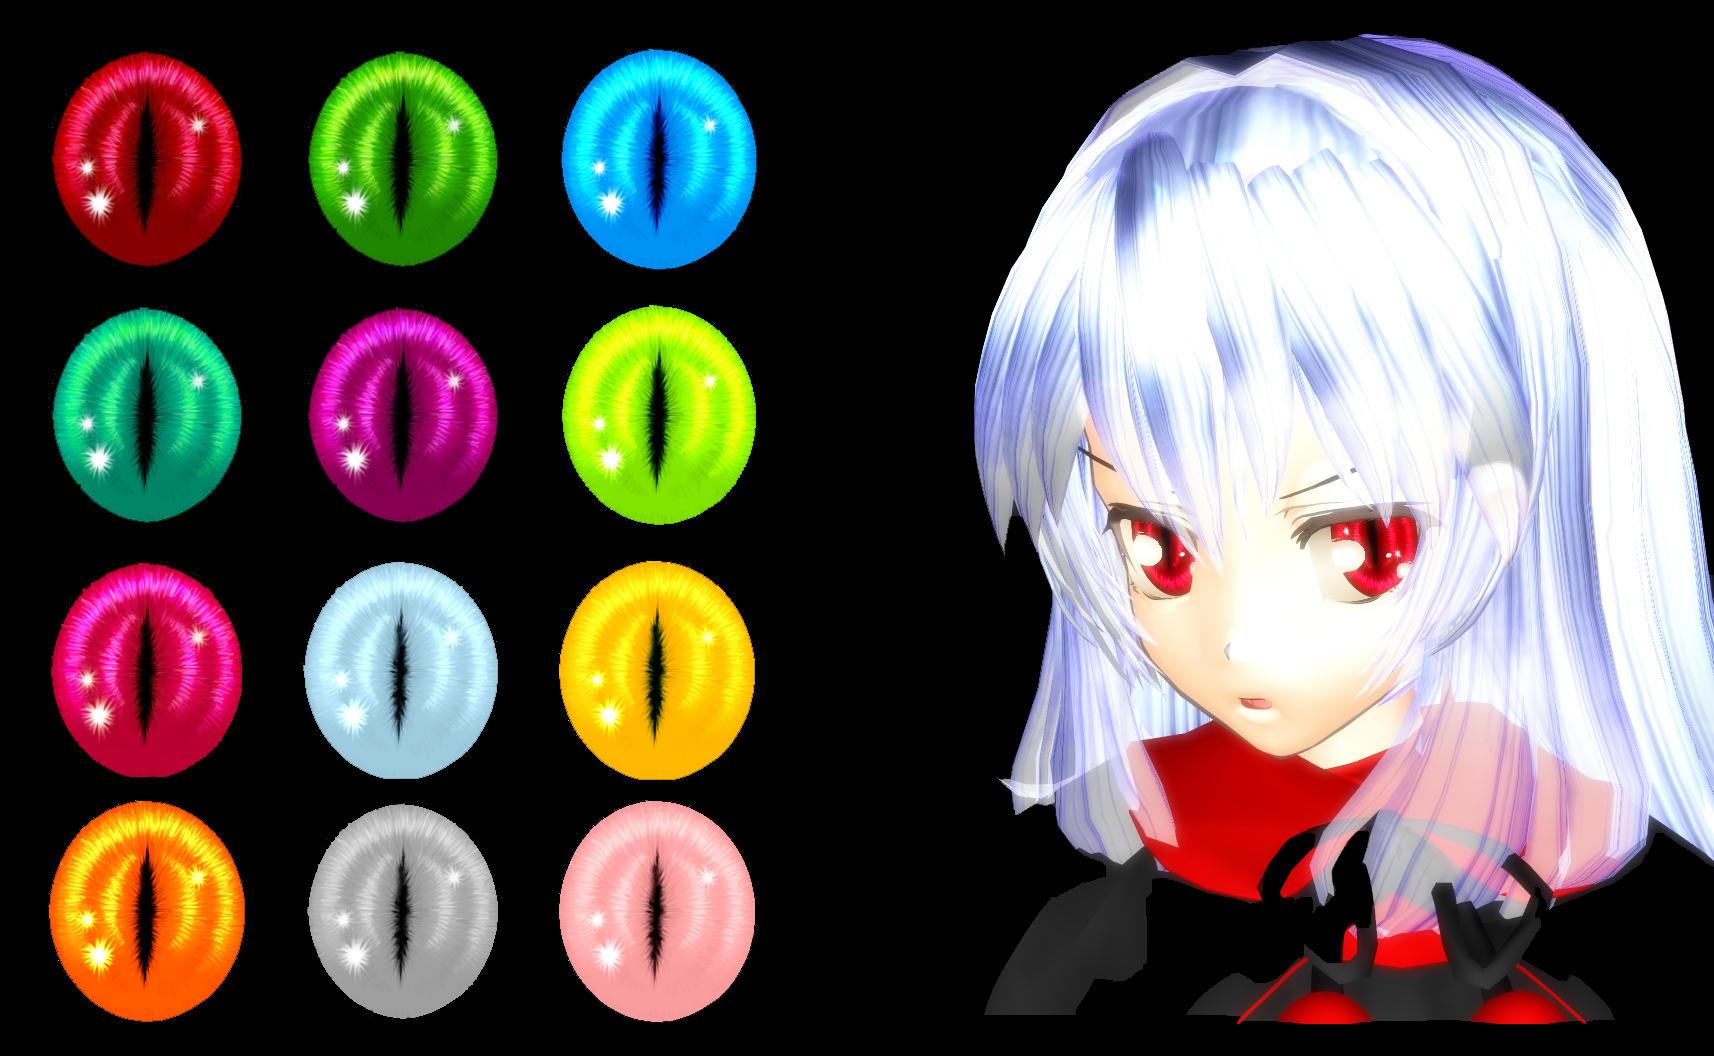 MMD Vampire Eye Texture by Xoriu